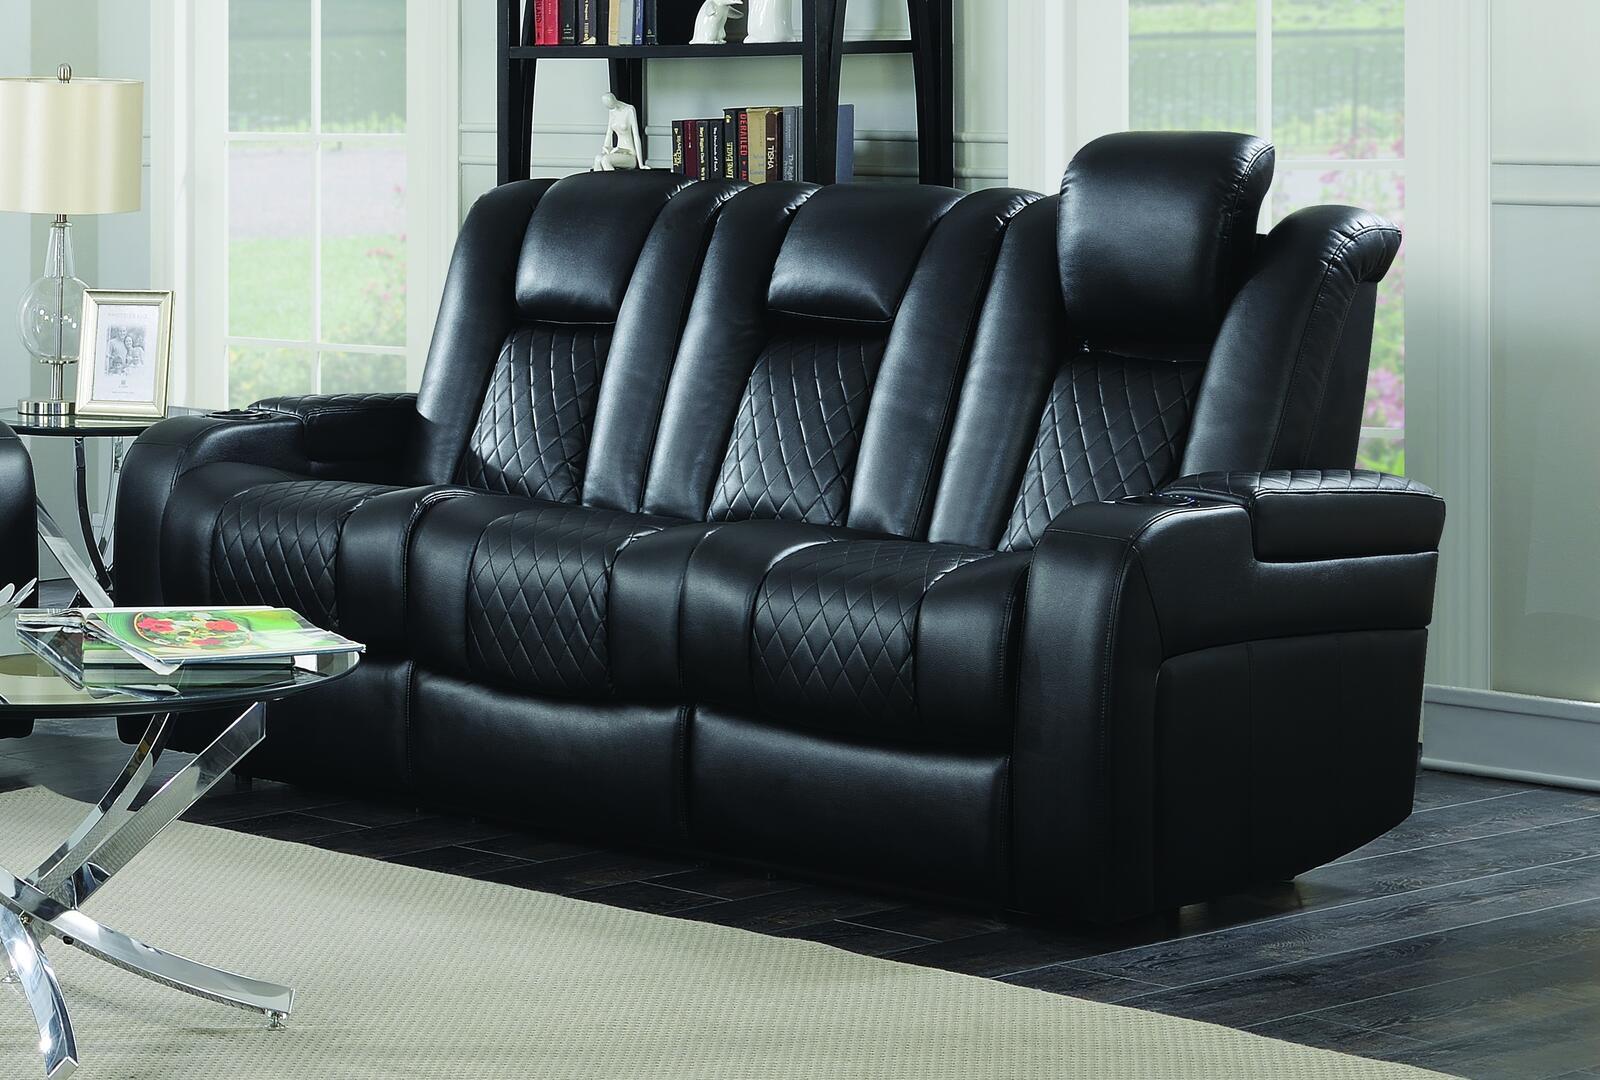 602301p 85 Inch Reclining Sofa